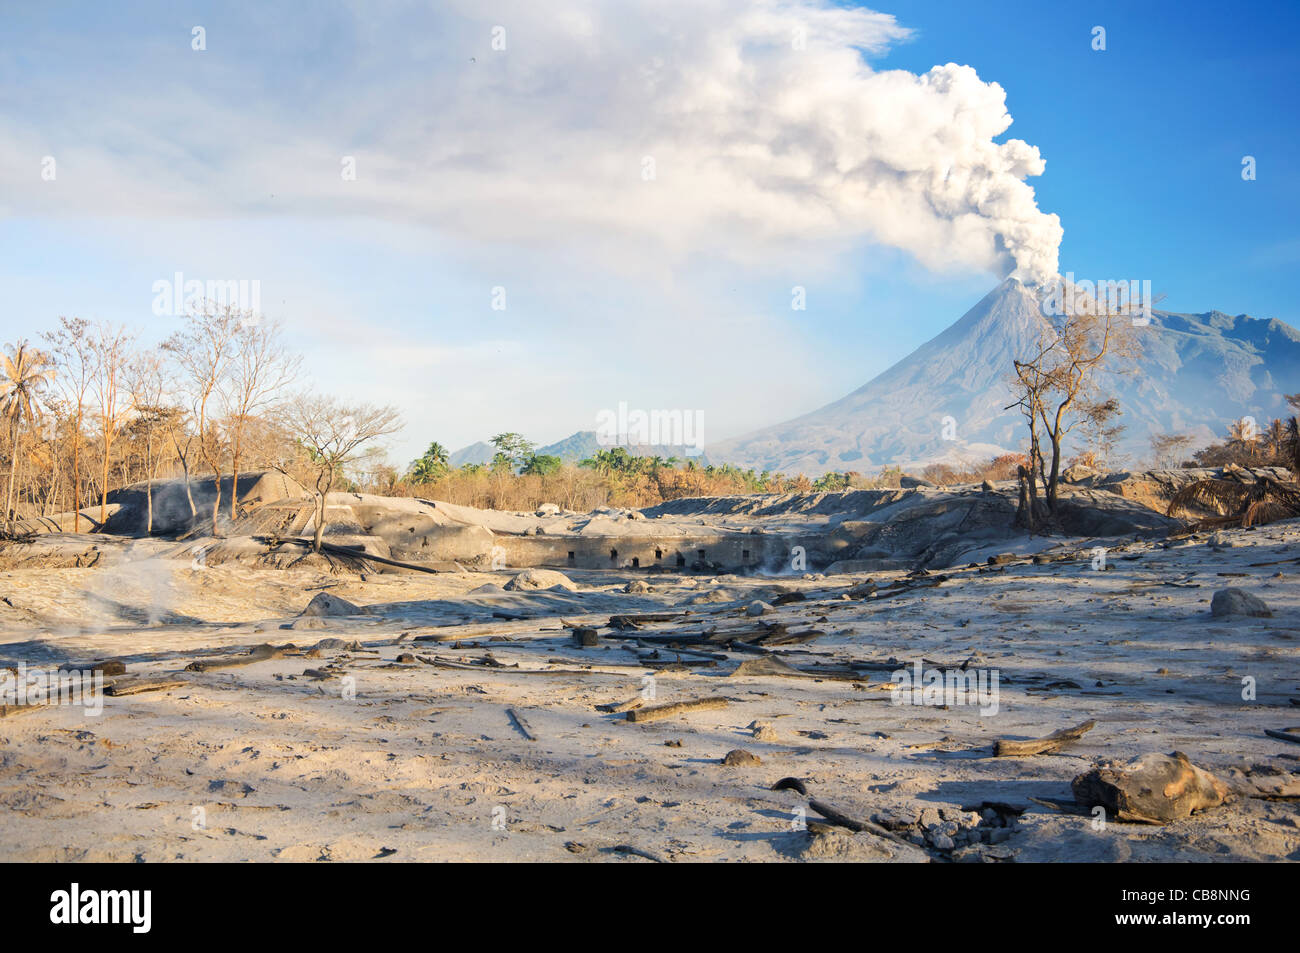 volcano eruption - Stock Image